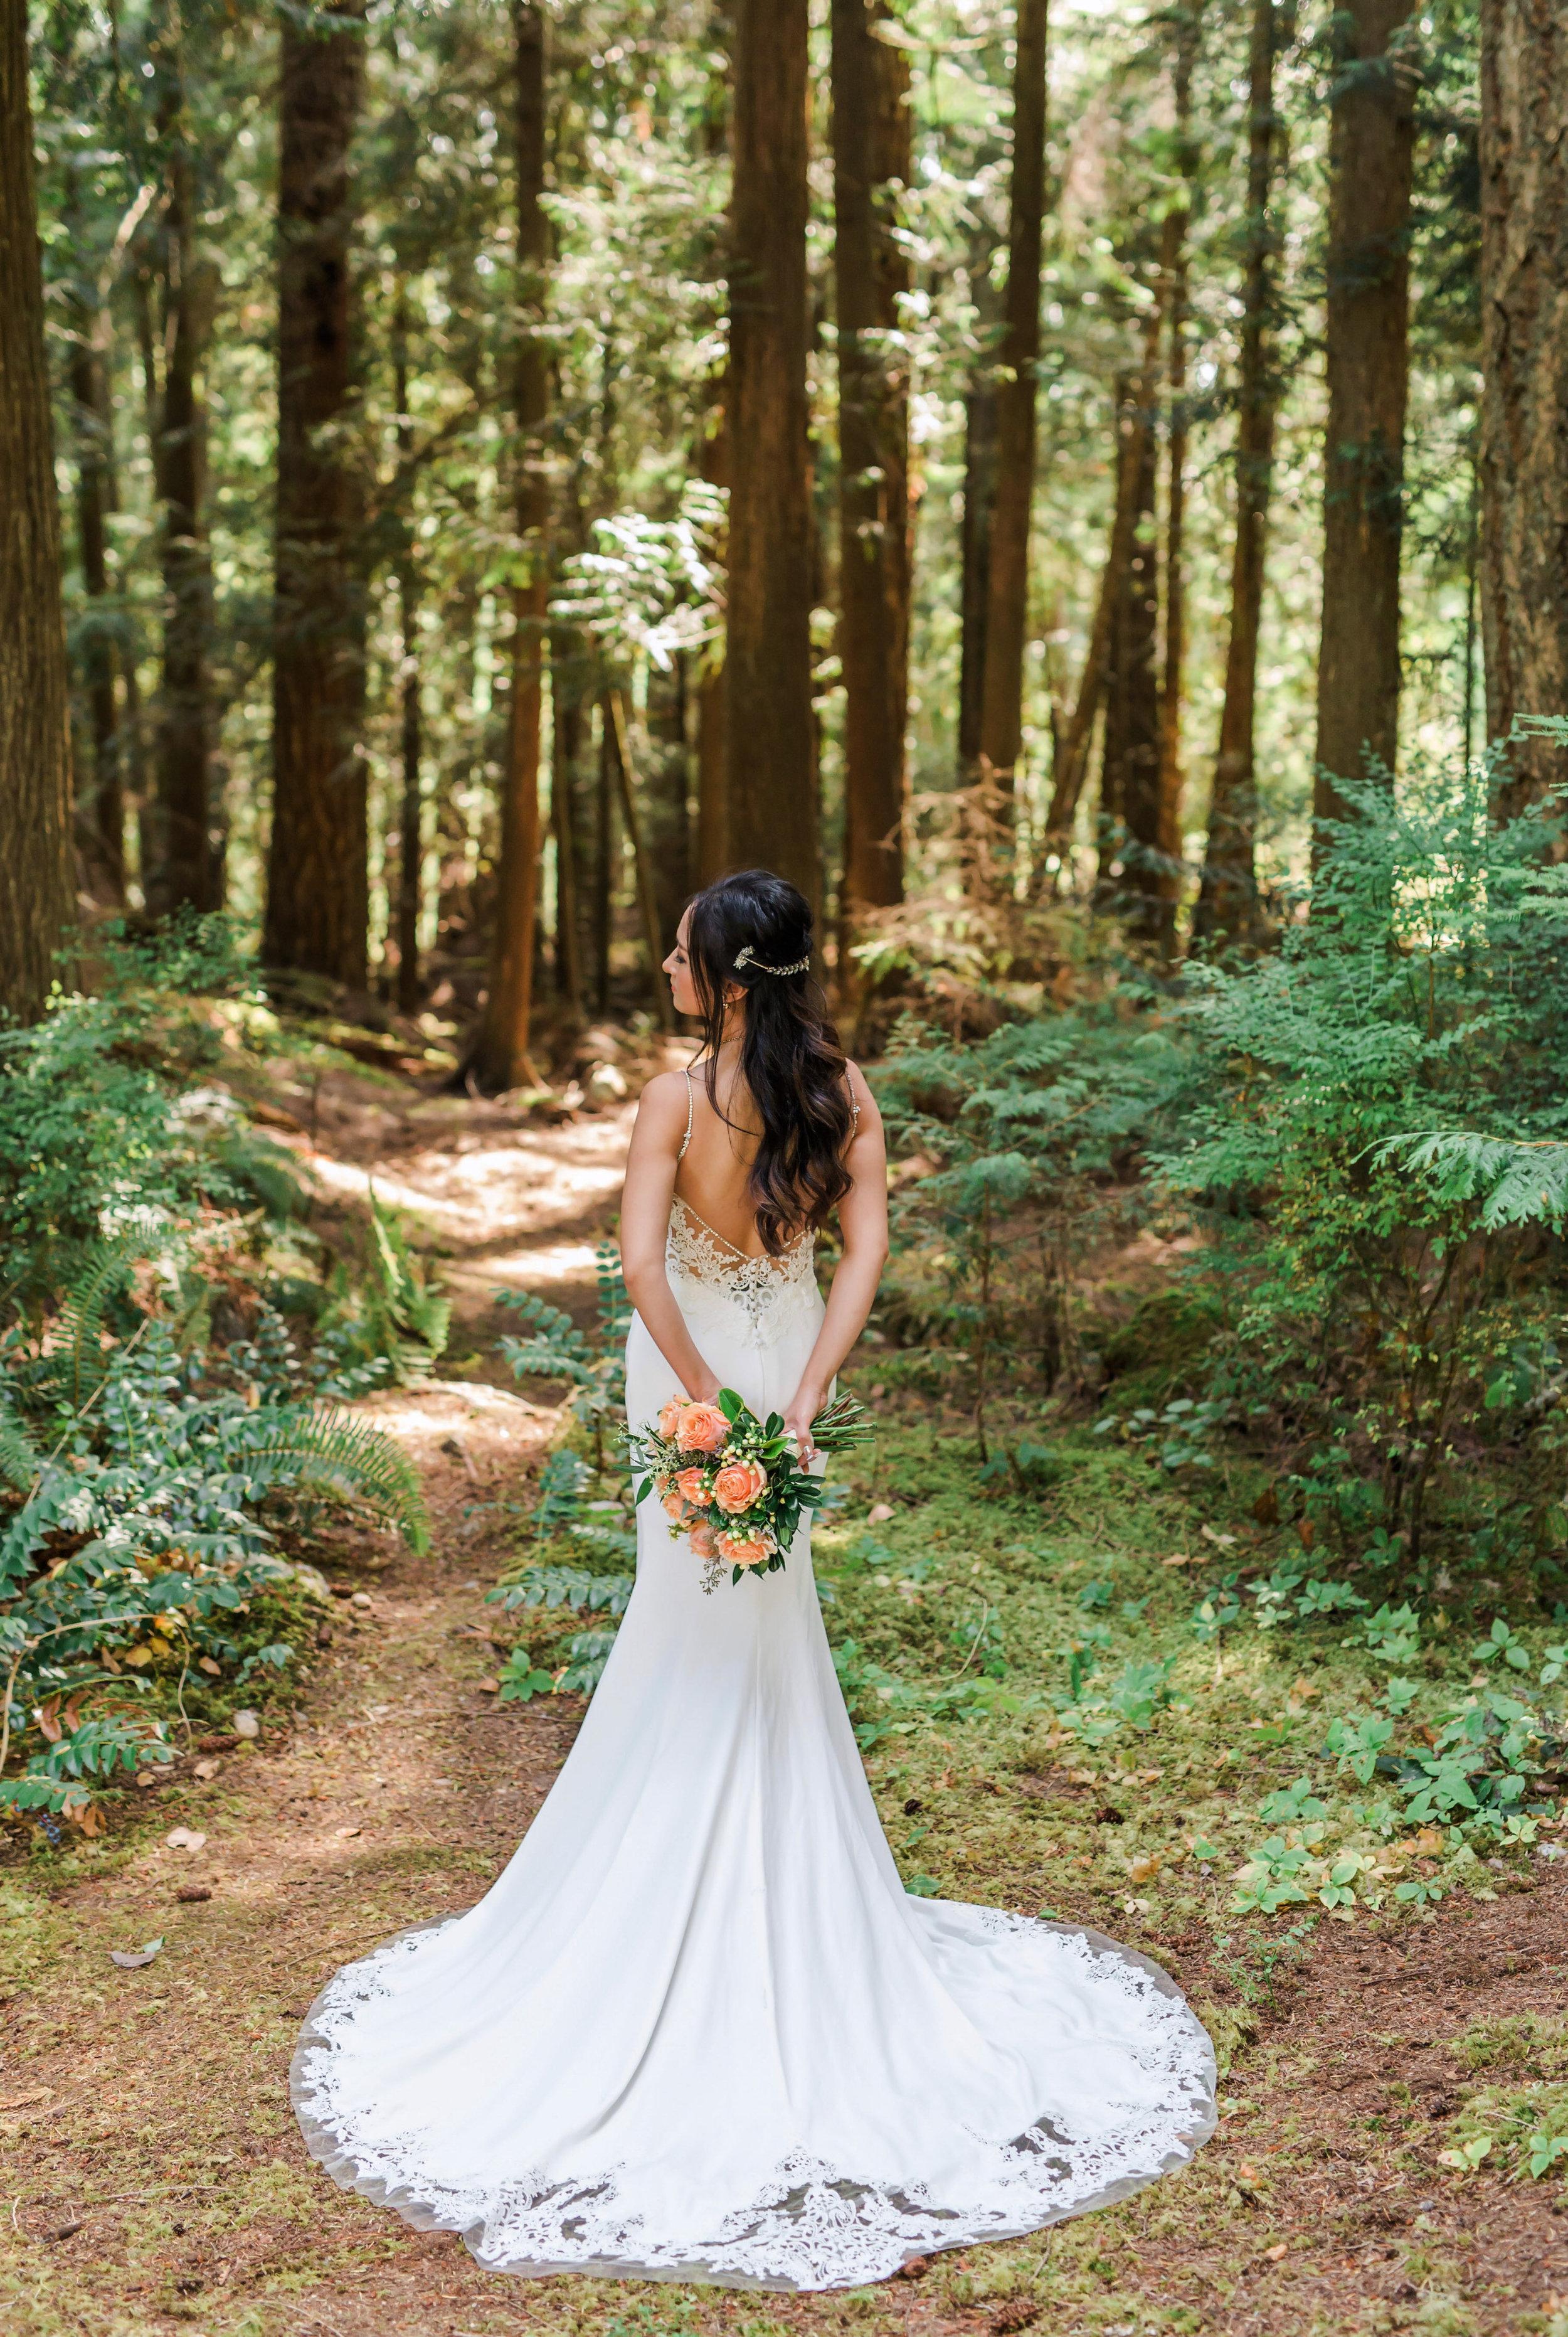 Linwood House Wedding Photos - Roberts Creek Wedding Photos - Vancouver Wedding Photographer & Videographer - Sunshine Coast Wedding Photos - Sunshine Coast Wedding Photographer - Jennifer Picard Photography - IMG_7617.jpg